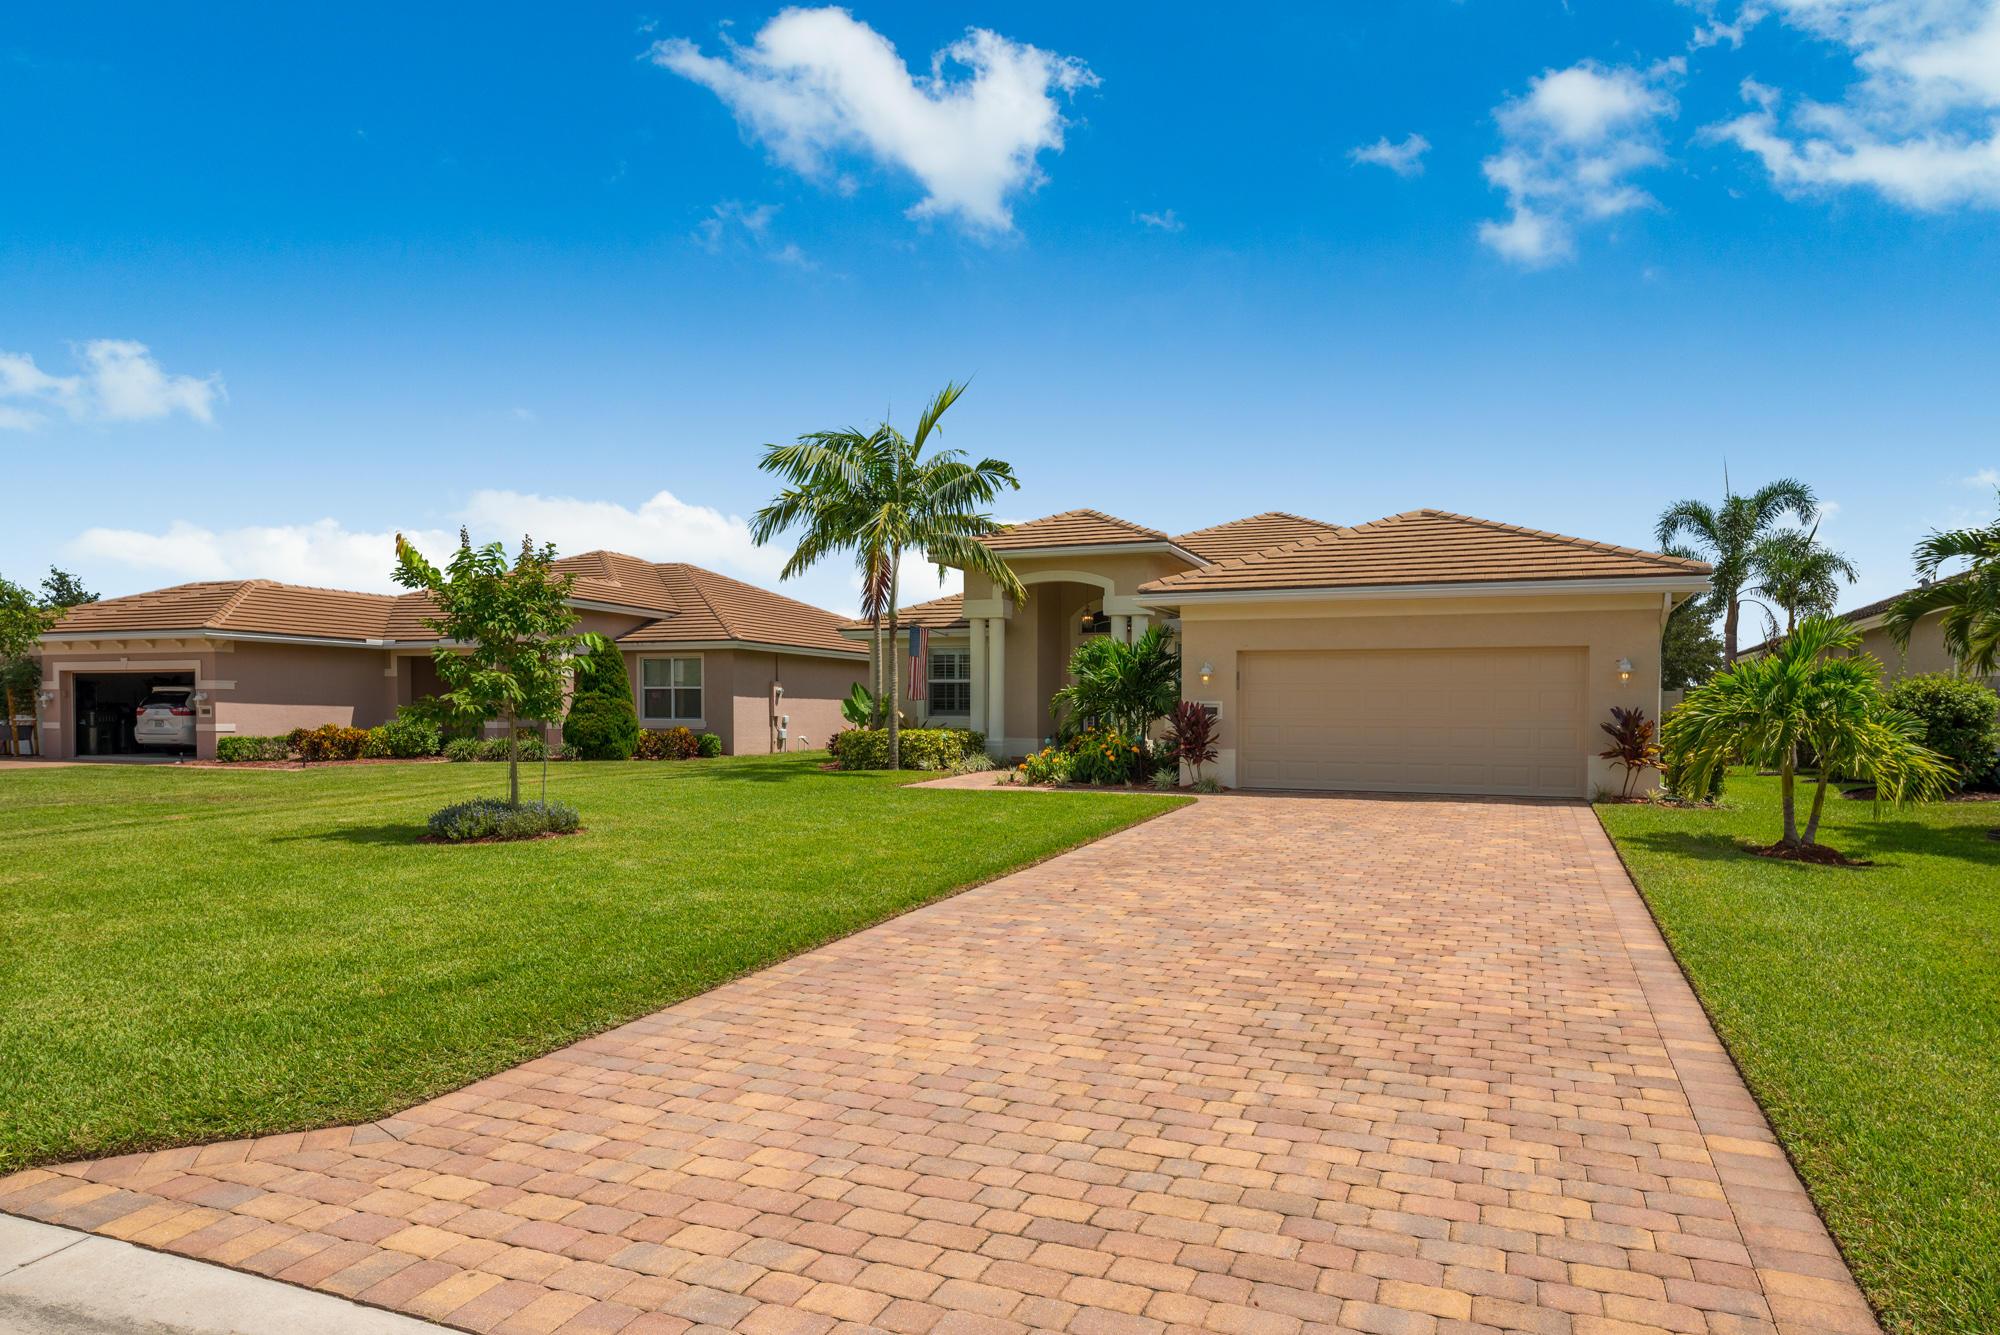 2189 Nw Dalea Way, Jensen Beach, FL 34957